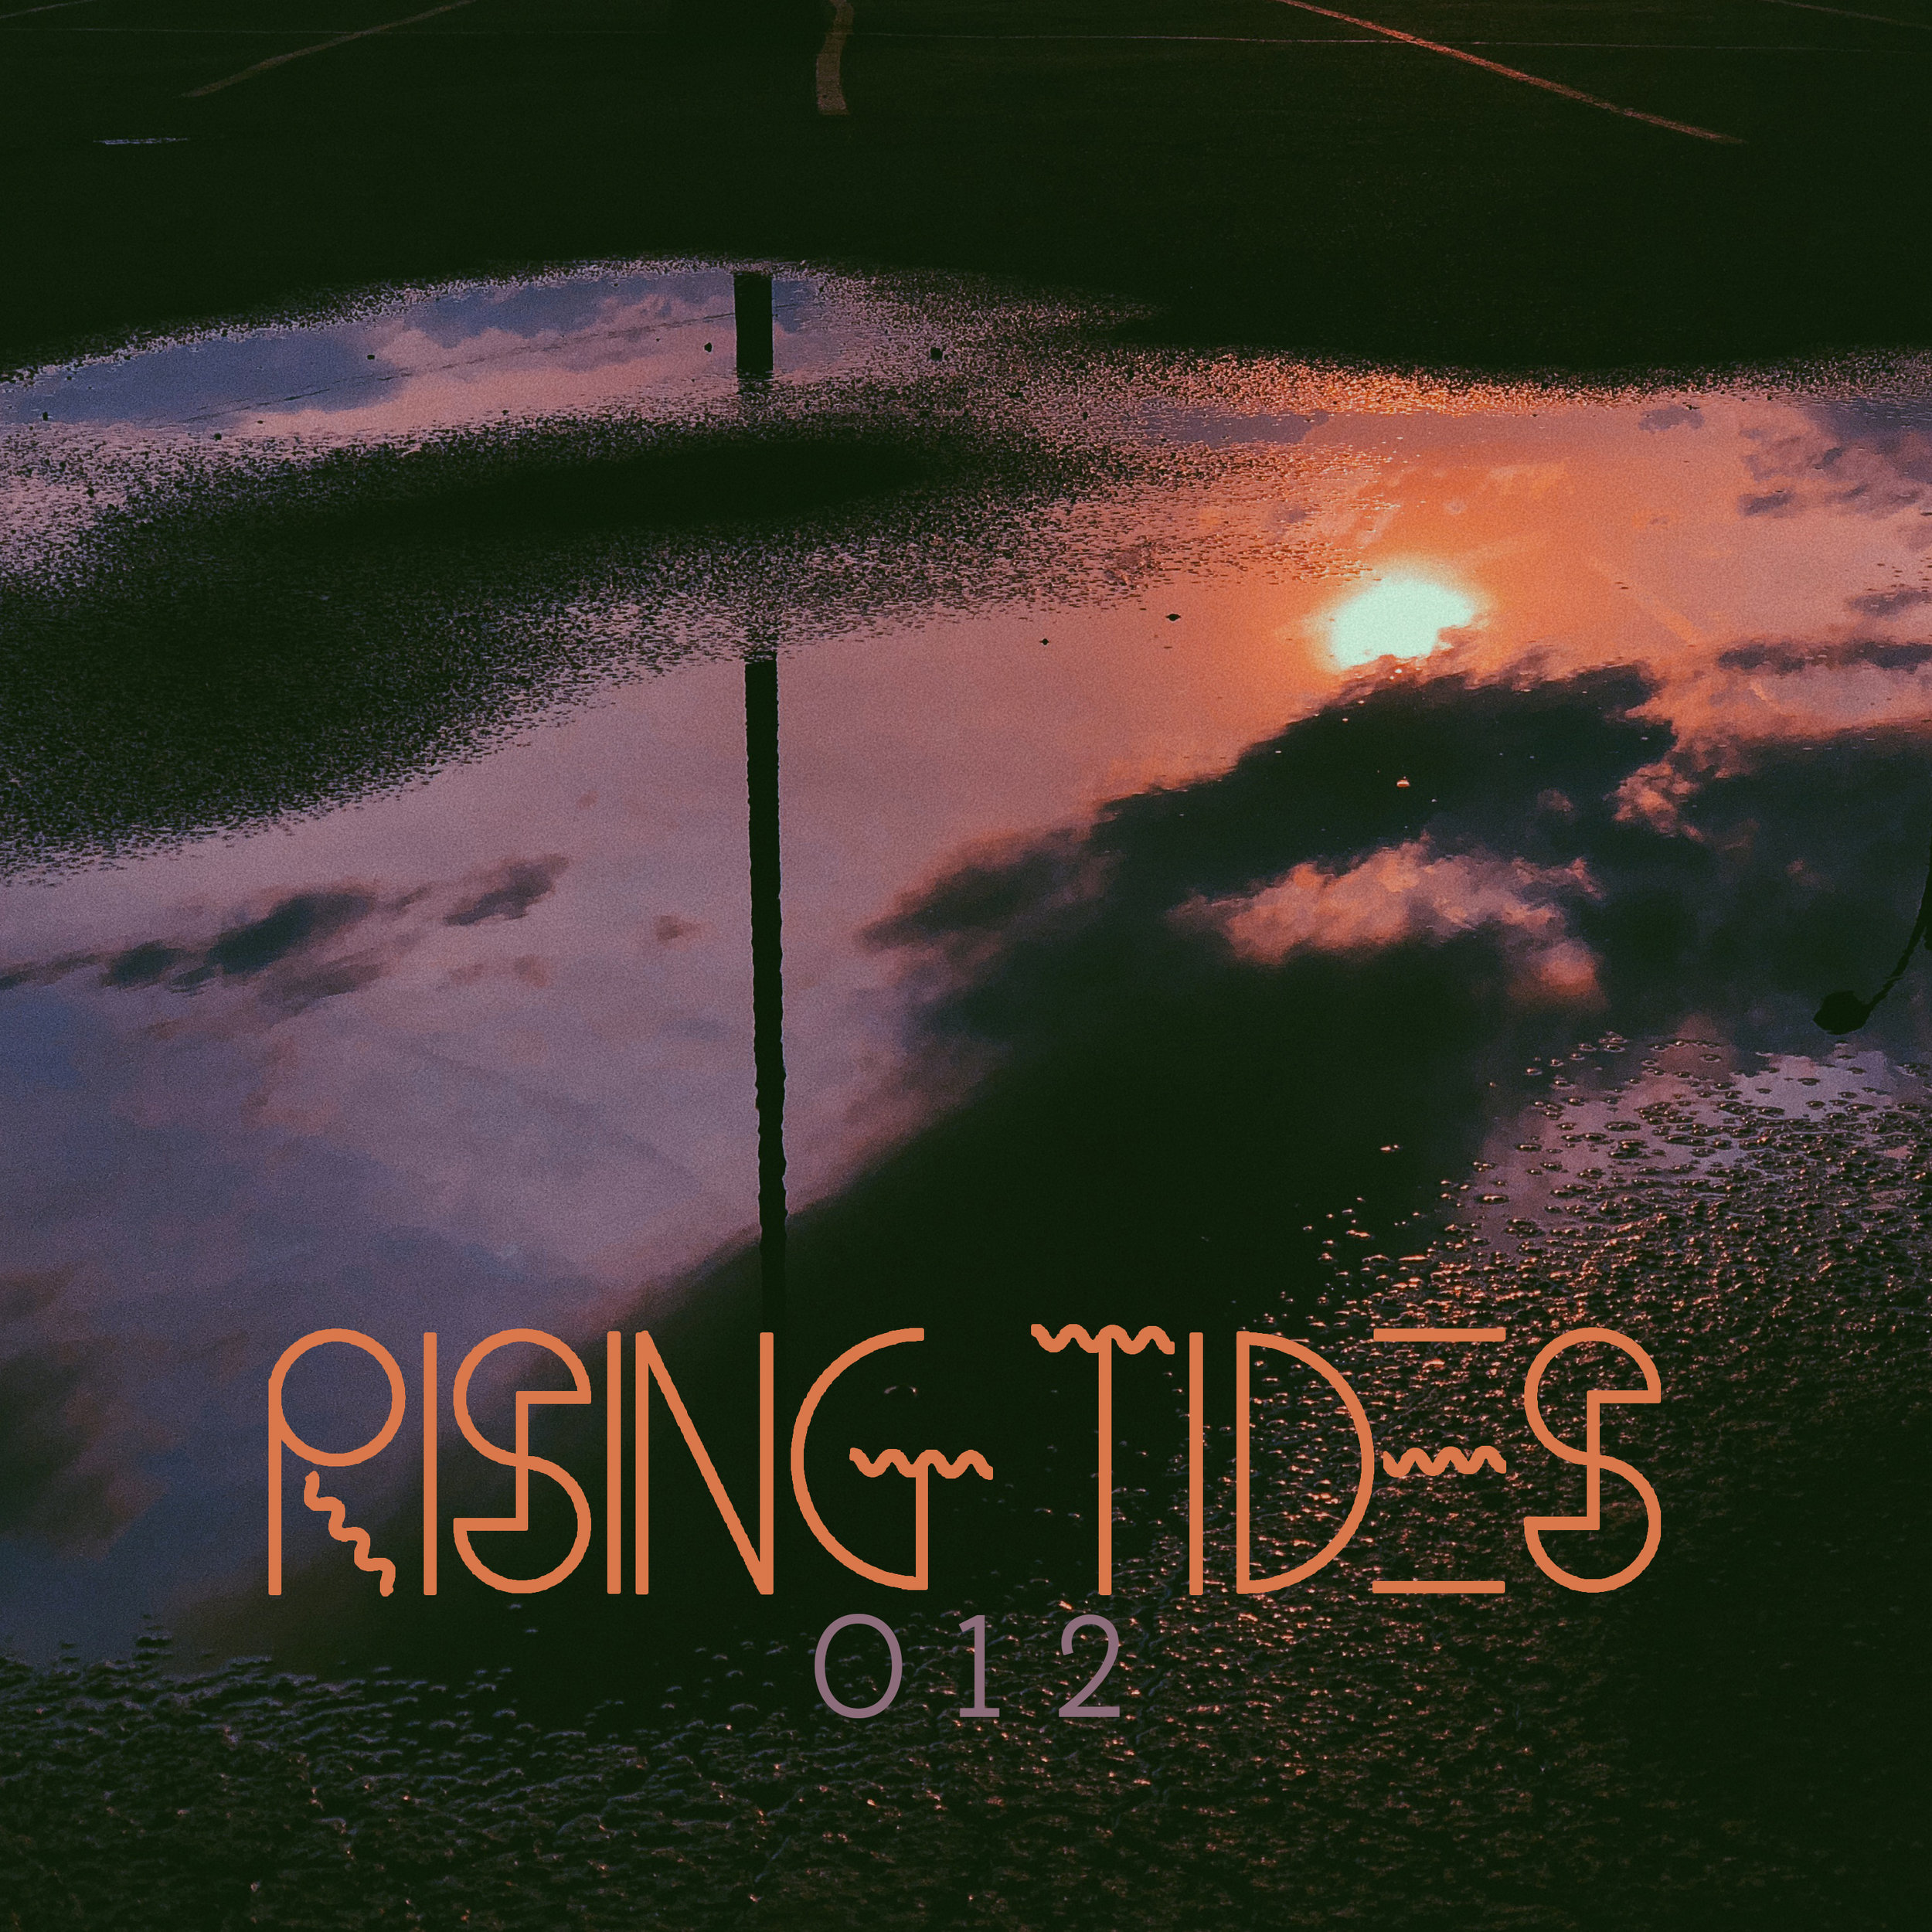 RISING TIDES 012.jpg